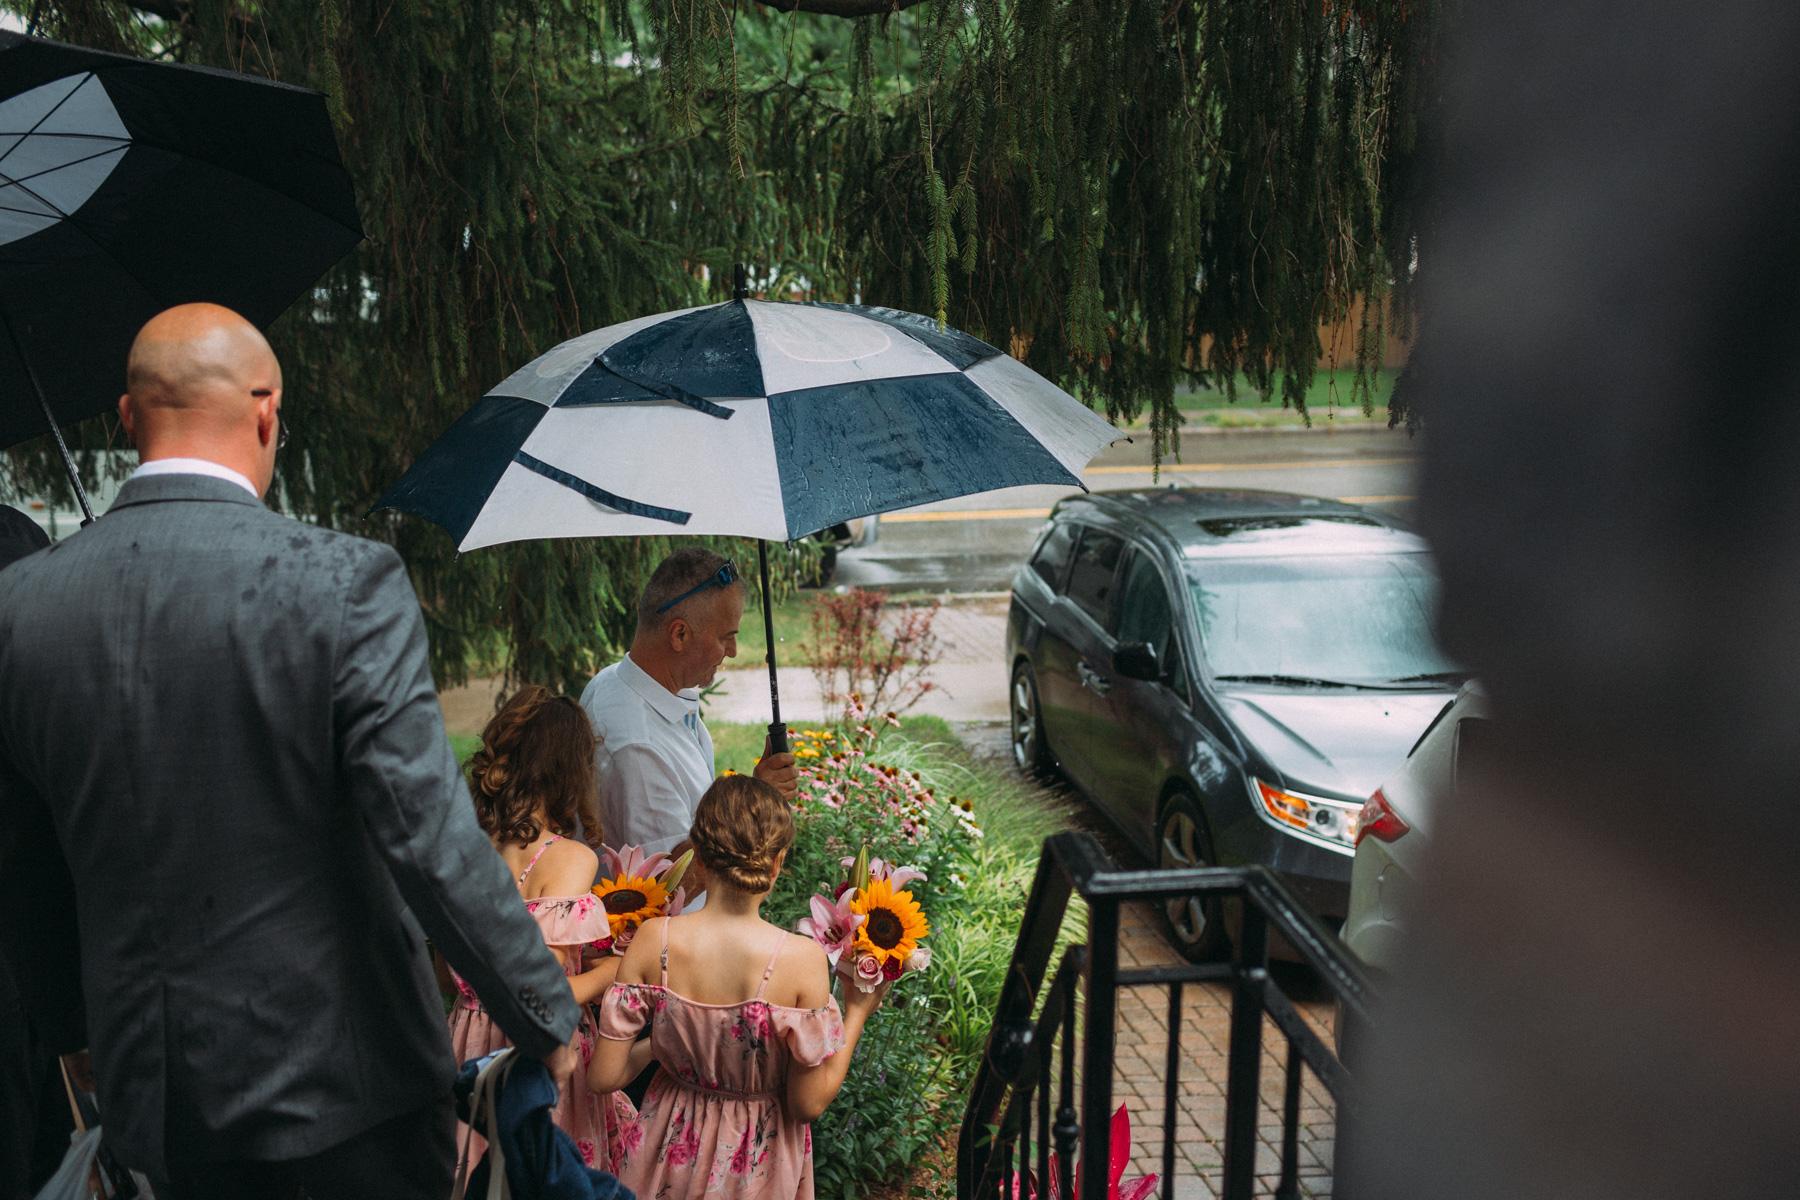 La-Maquette-wedding-by-Toronto-modern-wedding-photographer-Sam-Wong_17.jpg